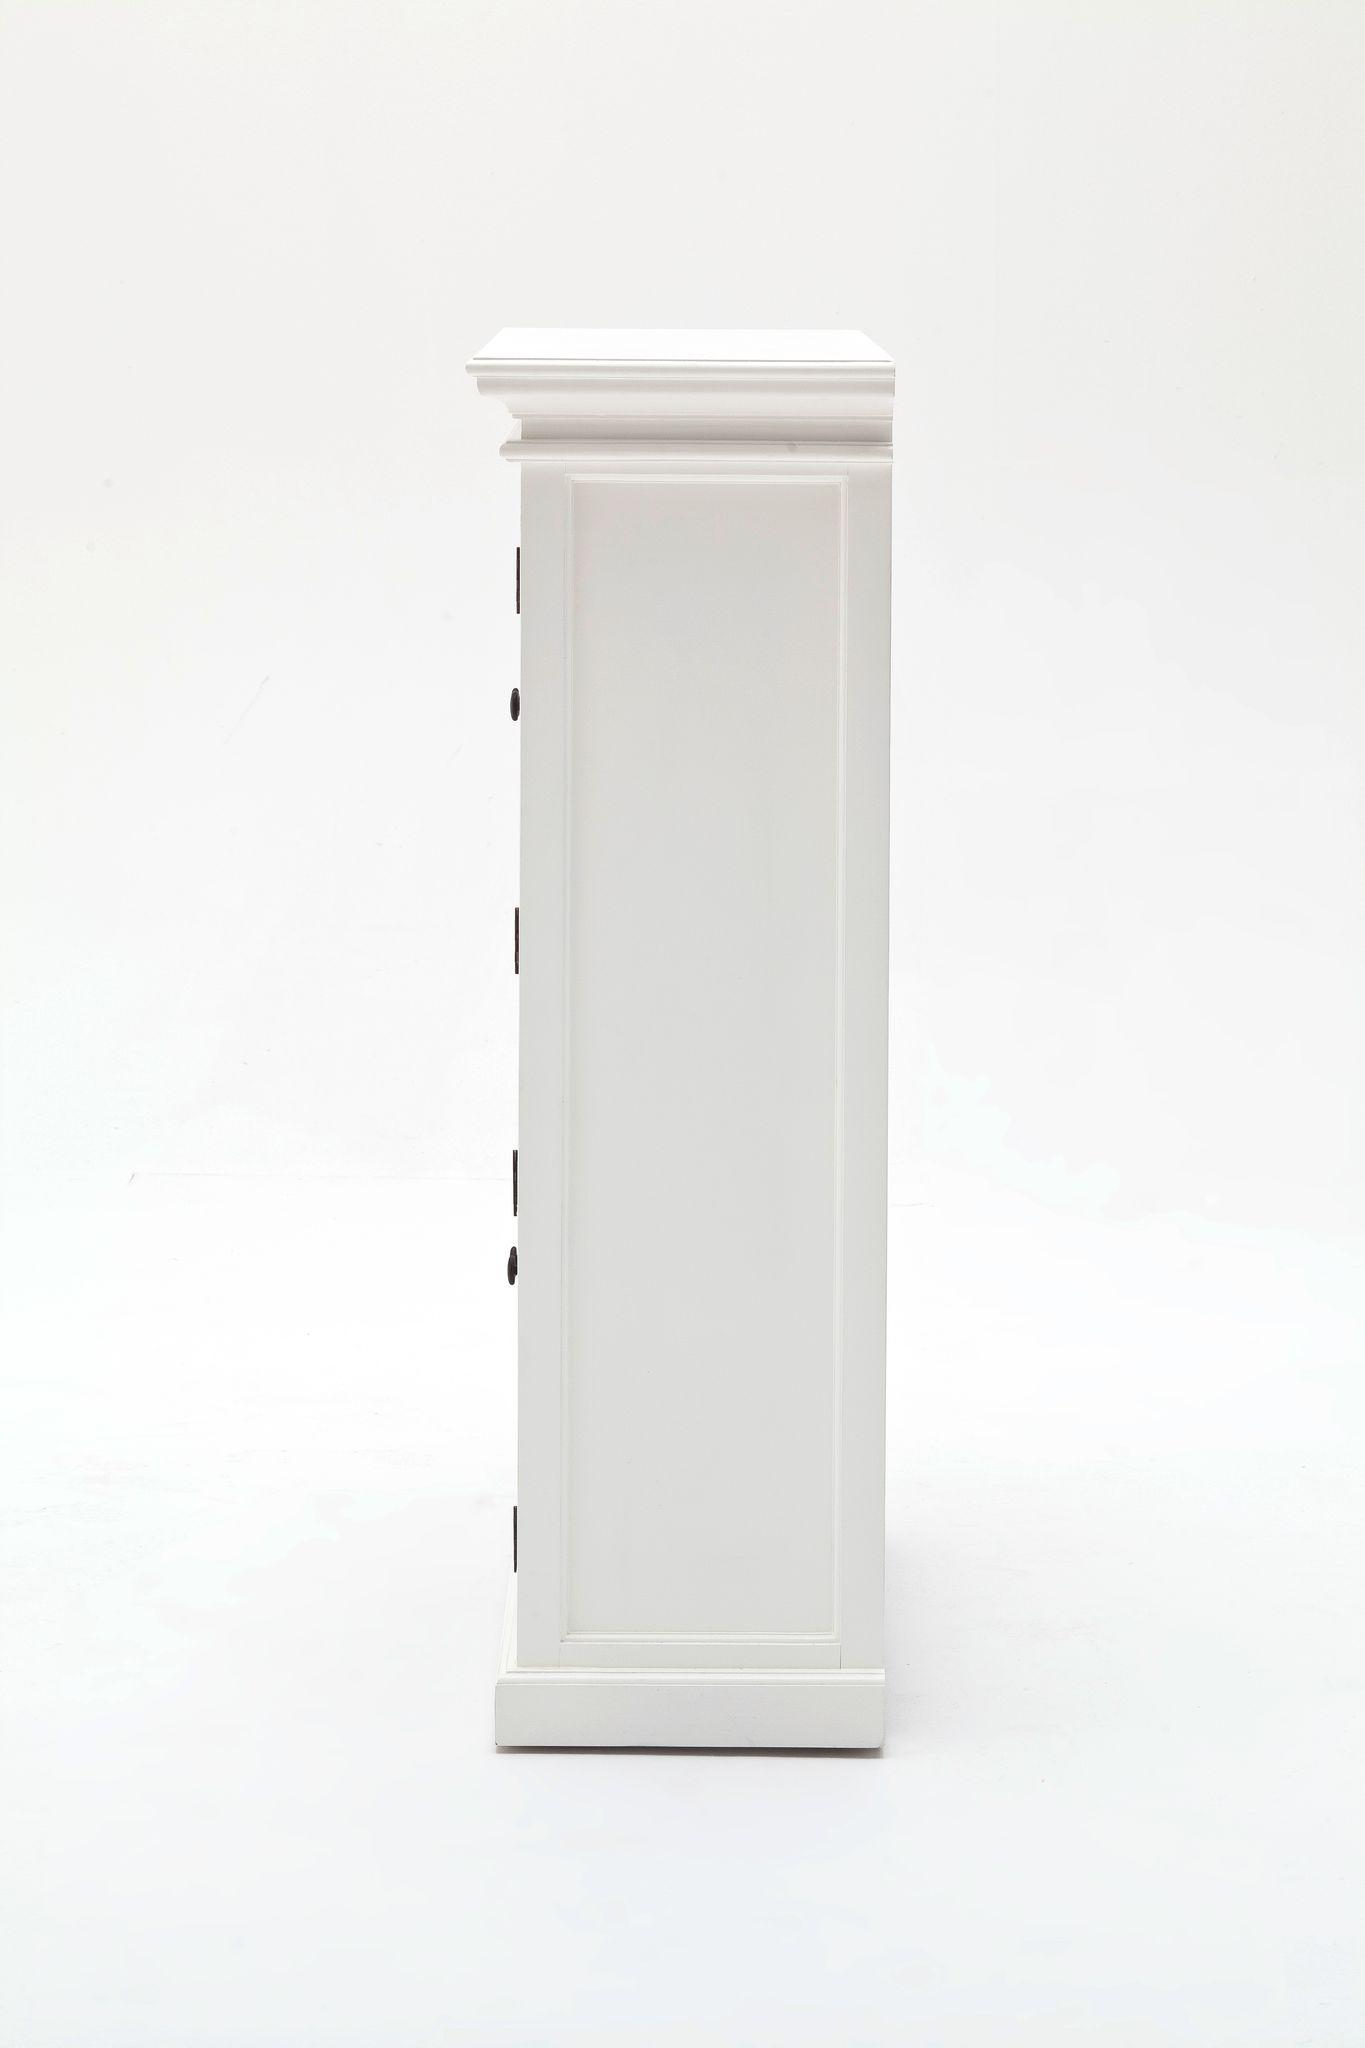 2-Level Pantry